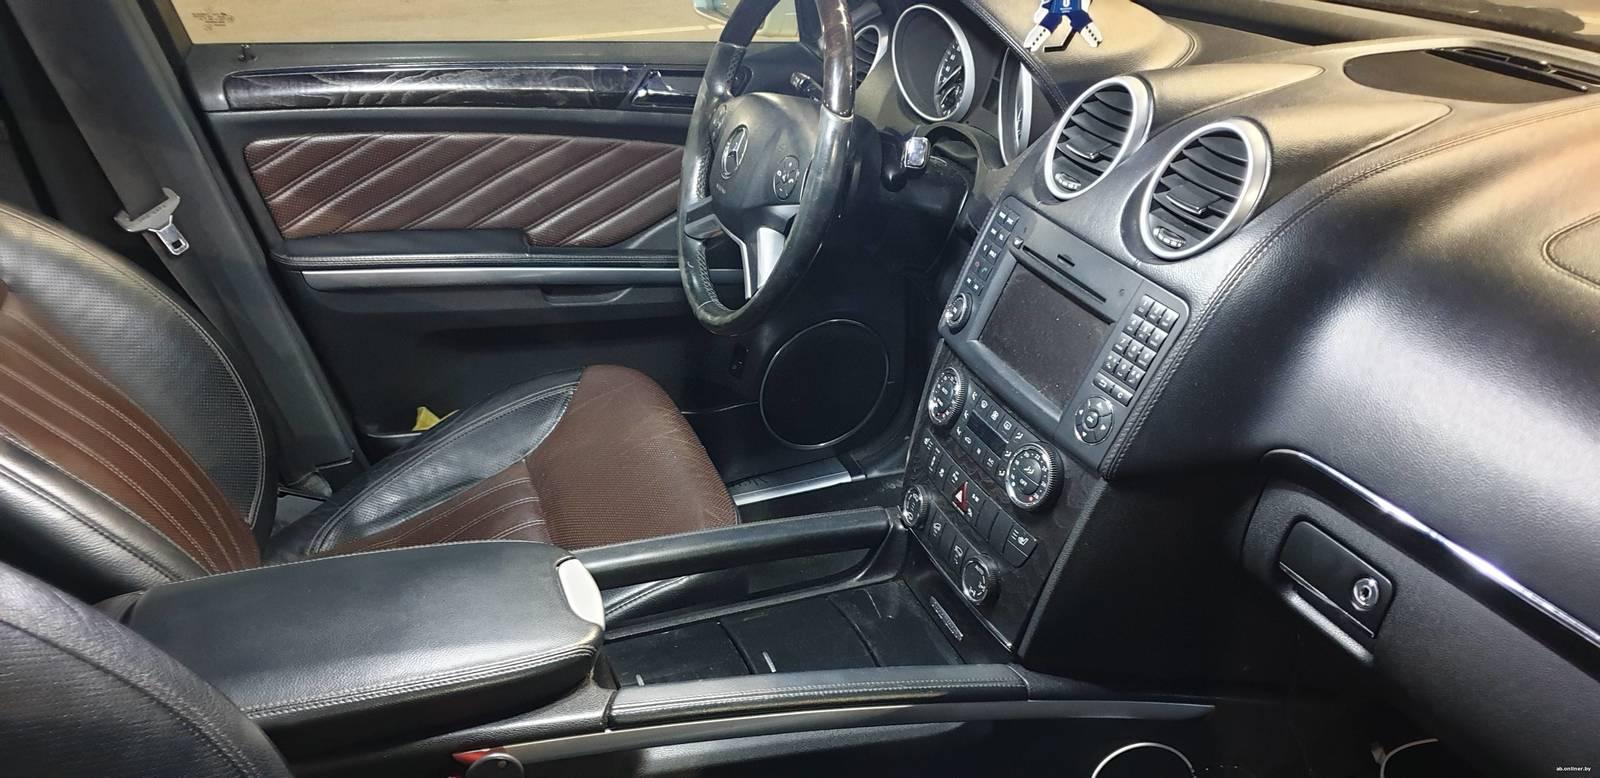 Mercedes-Benz GL350 Grand Edition